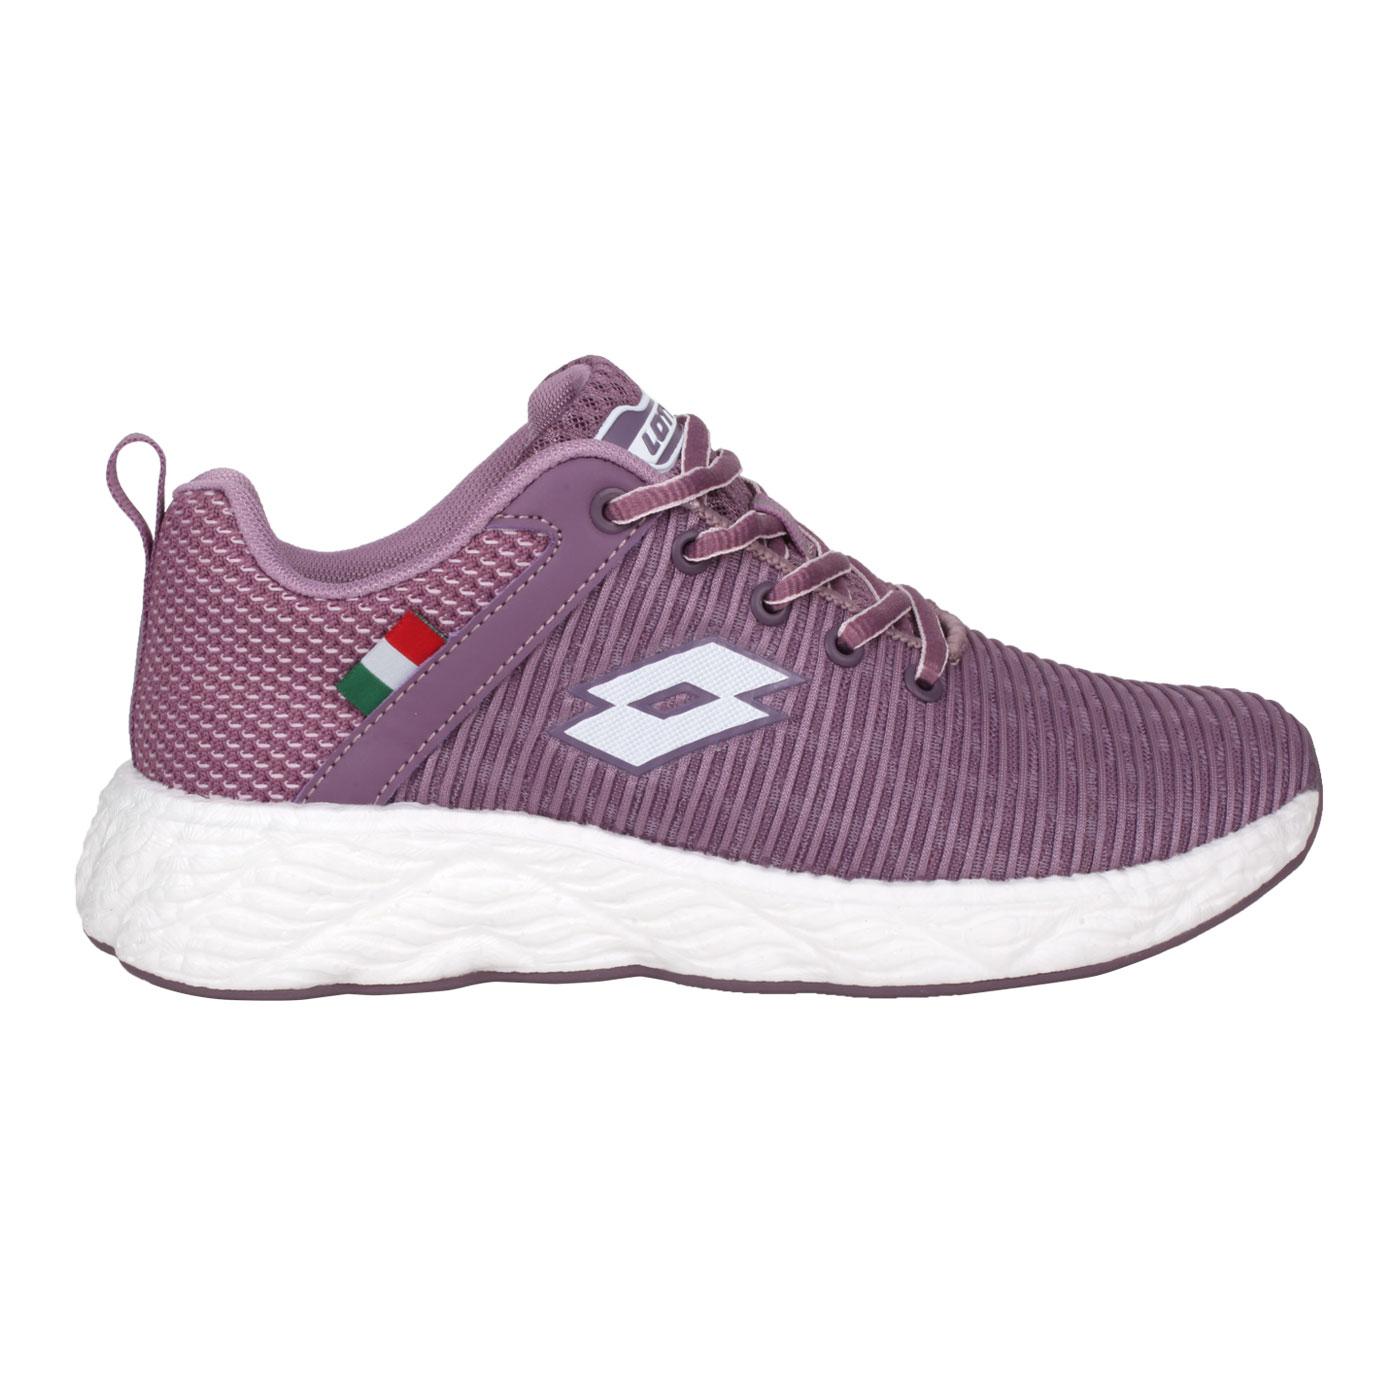 LOTTO 女款創跑鞋 LT1AWR3517 - 葡萄紫白